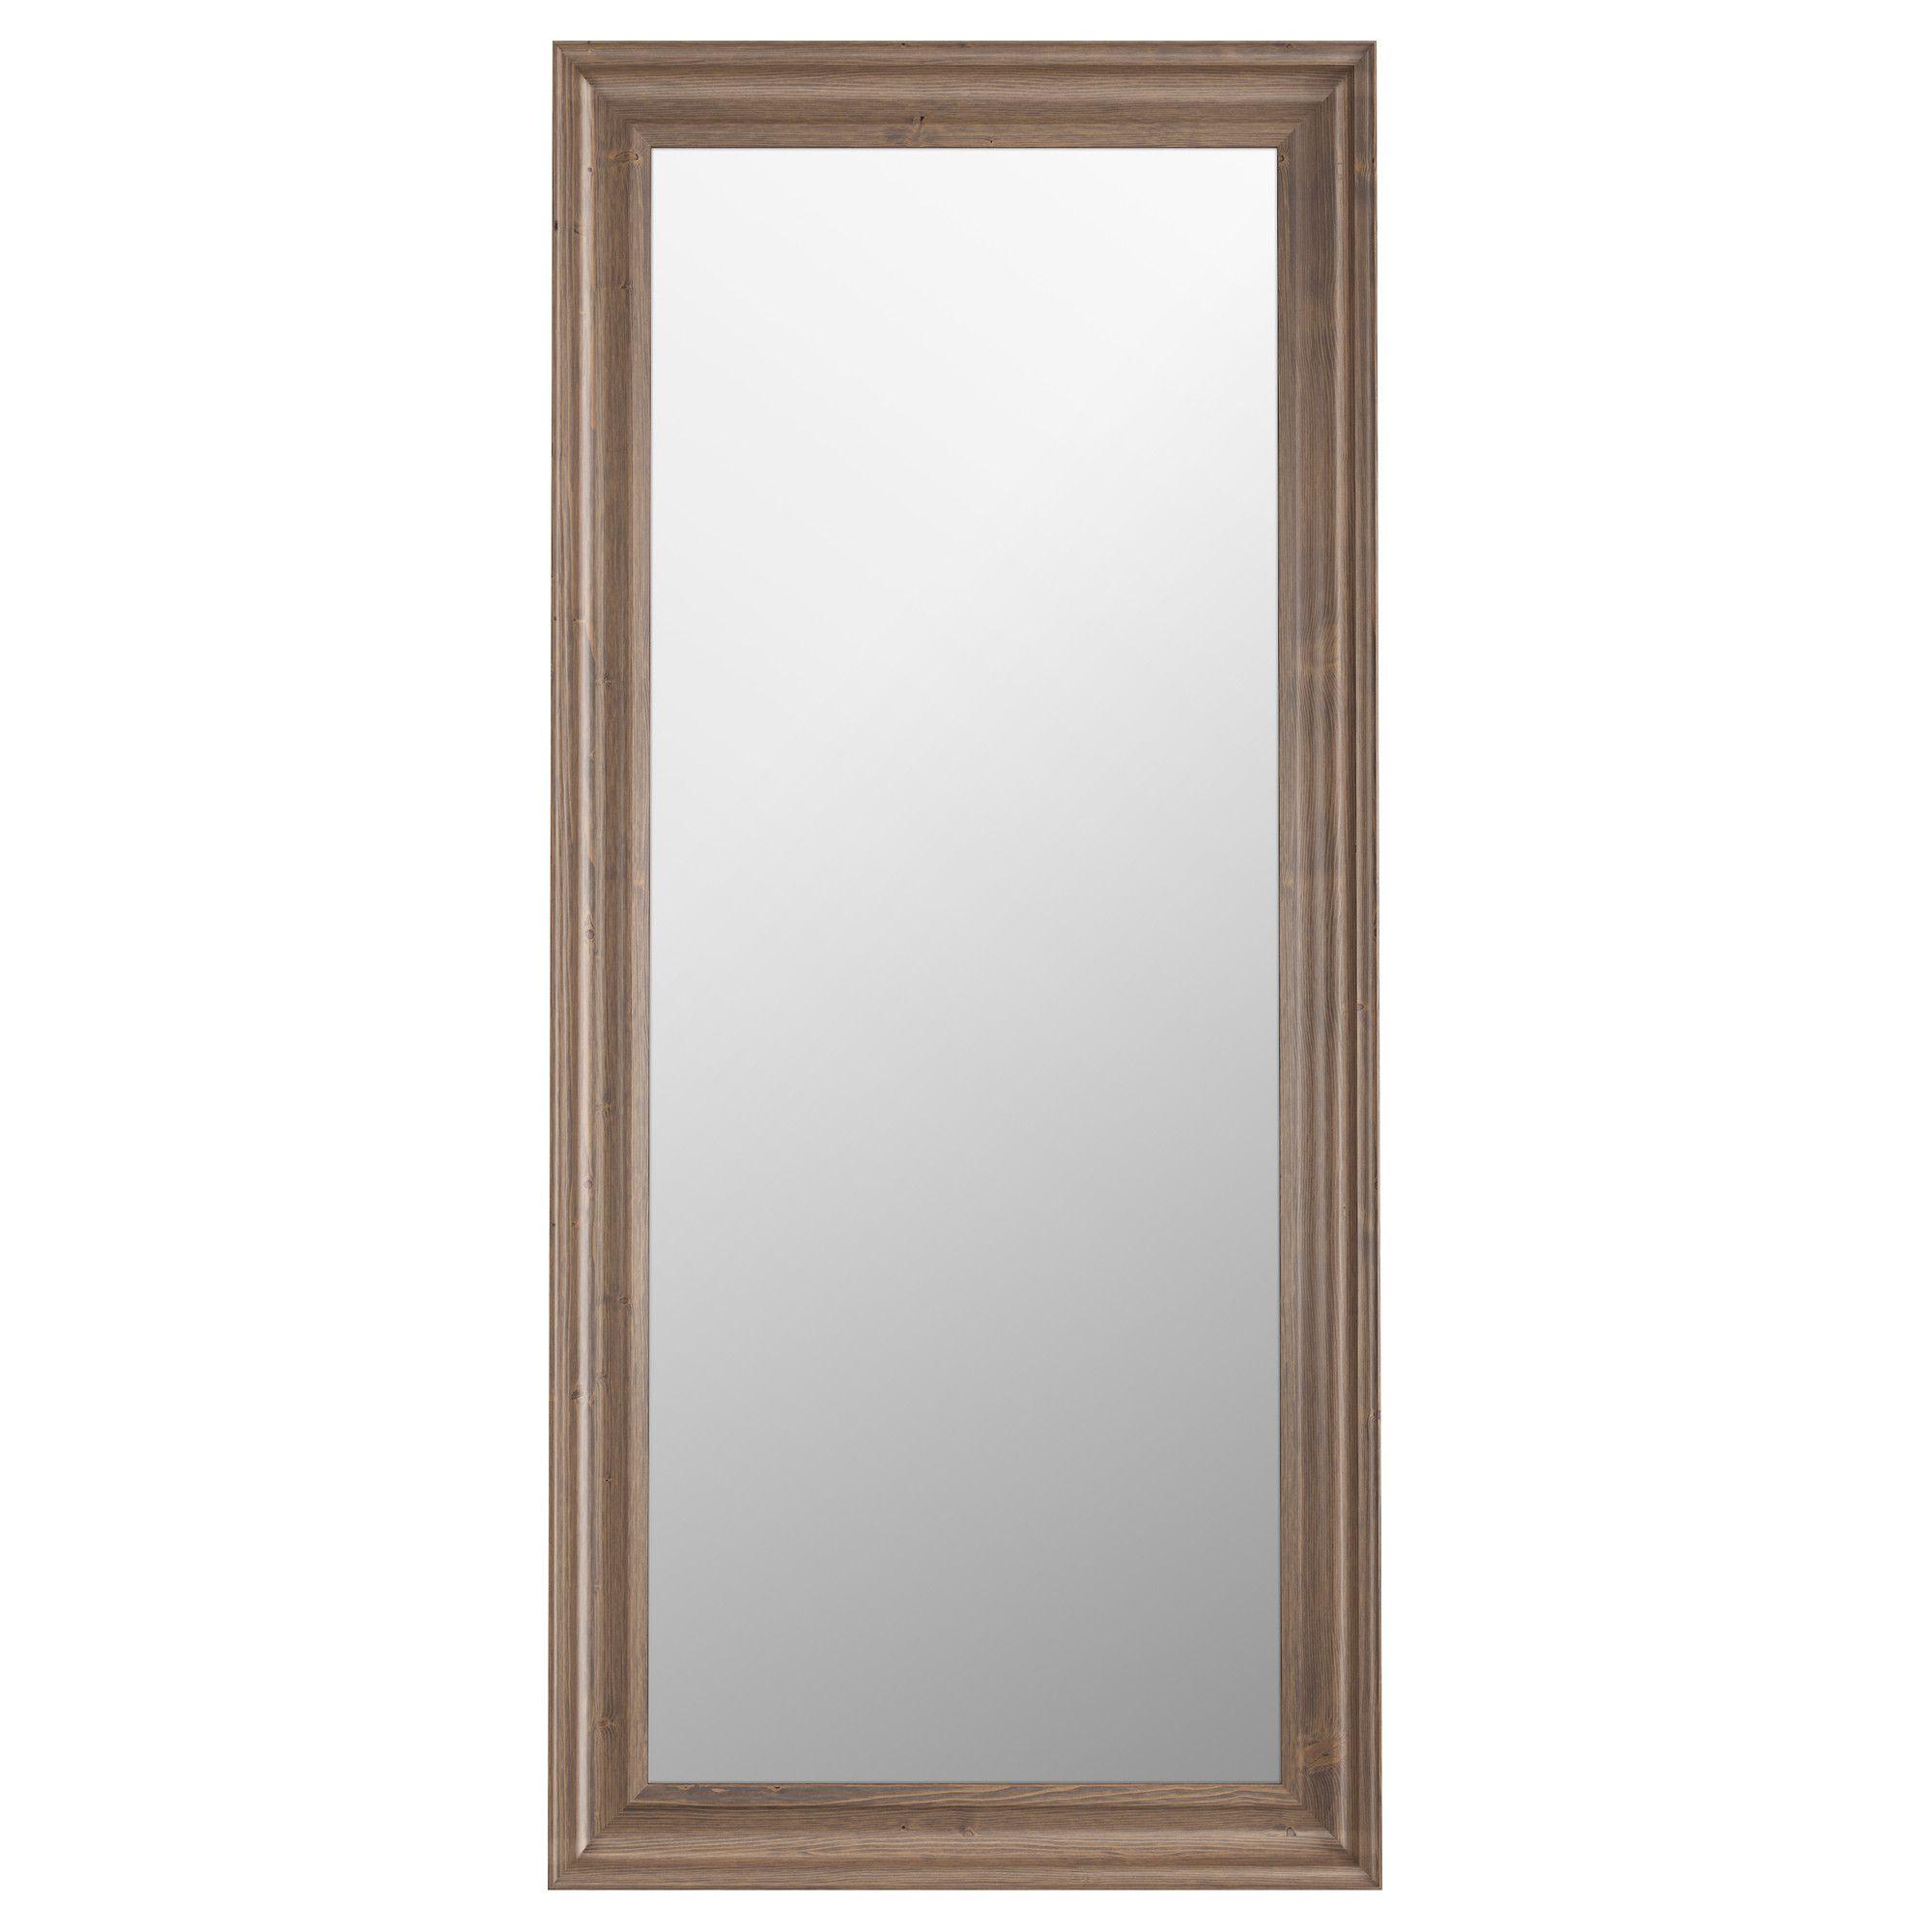 69 90€ HEMNES Miroir gris brun IKEA